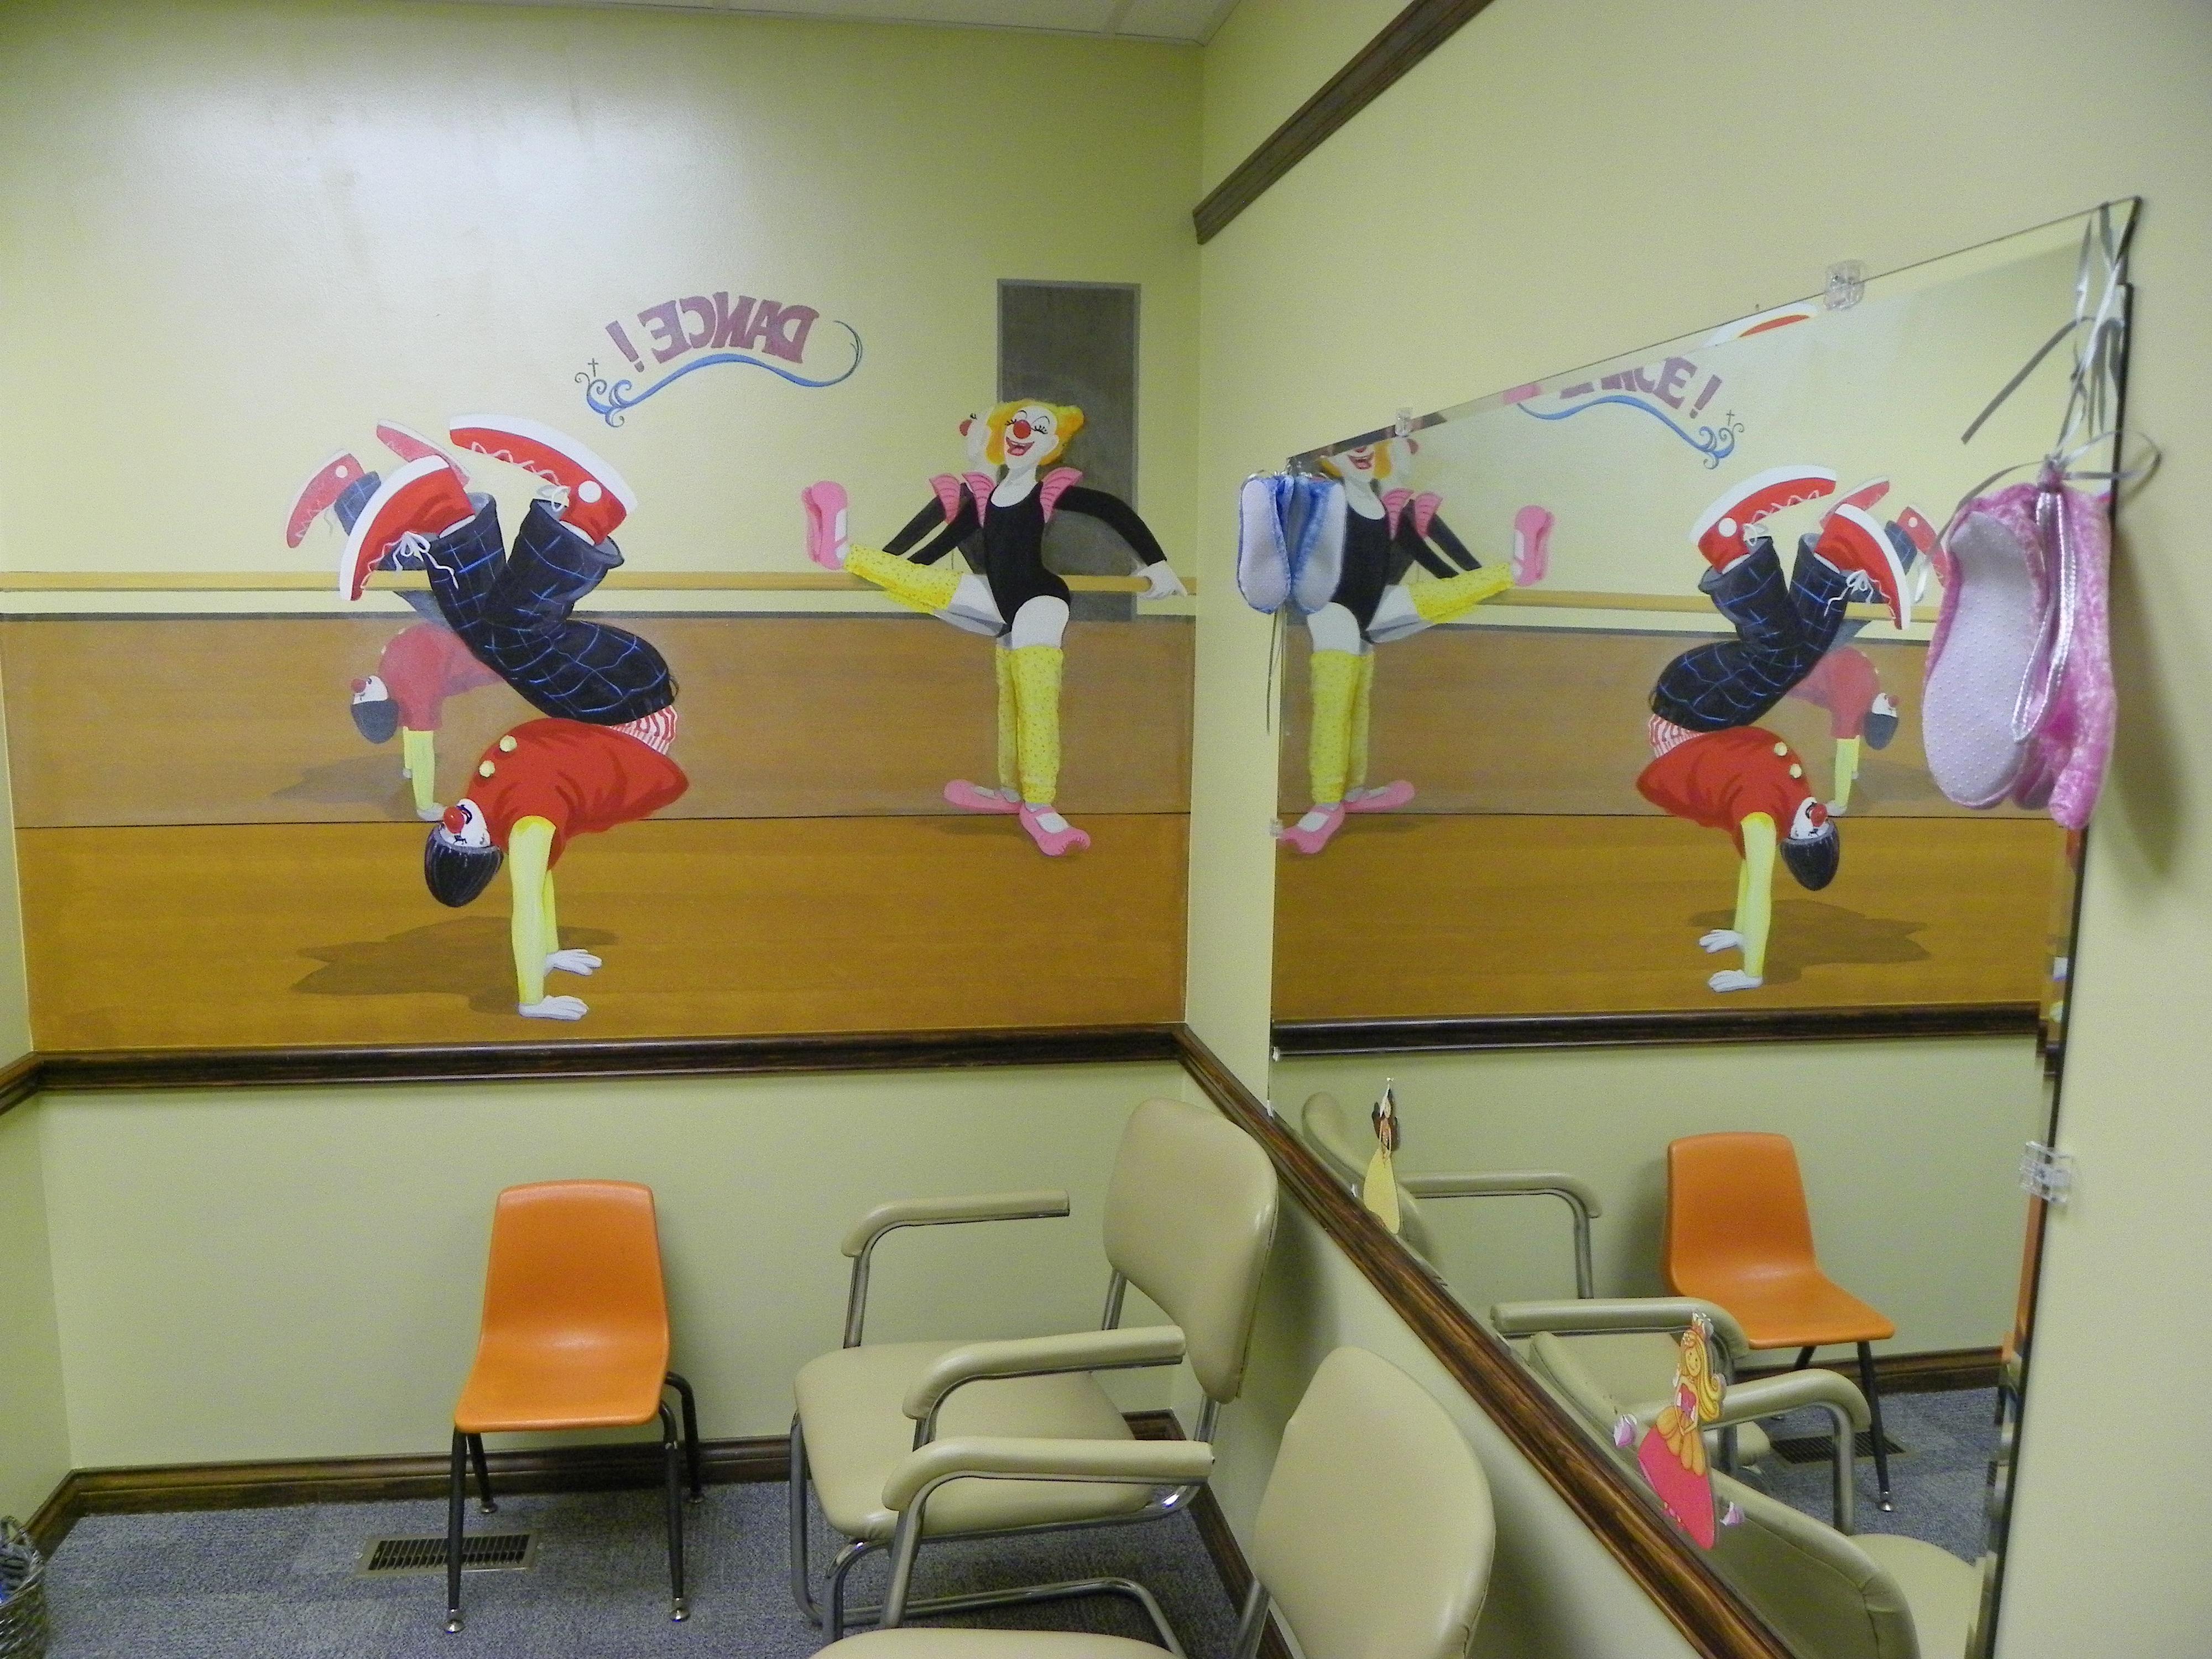 Dance Academy Themed Room. Office Tour   Clown Pediatrics